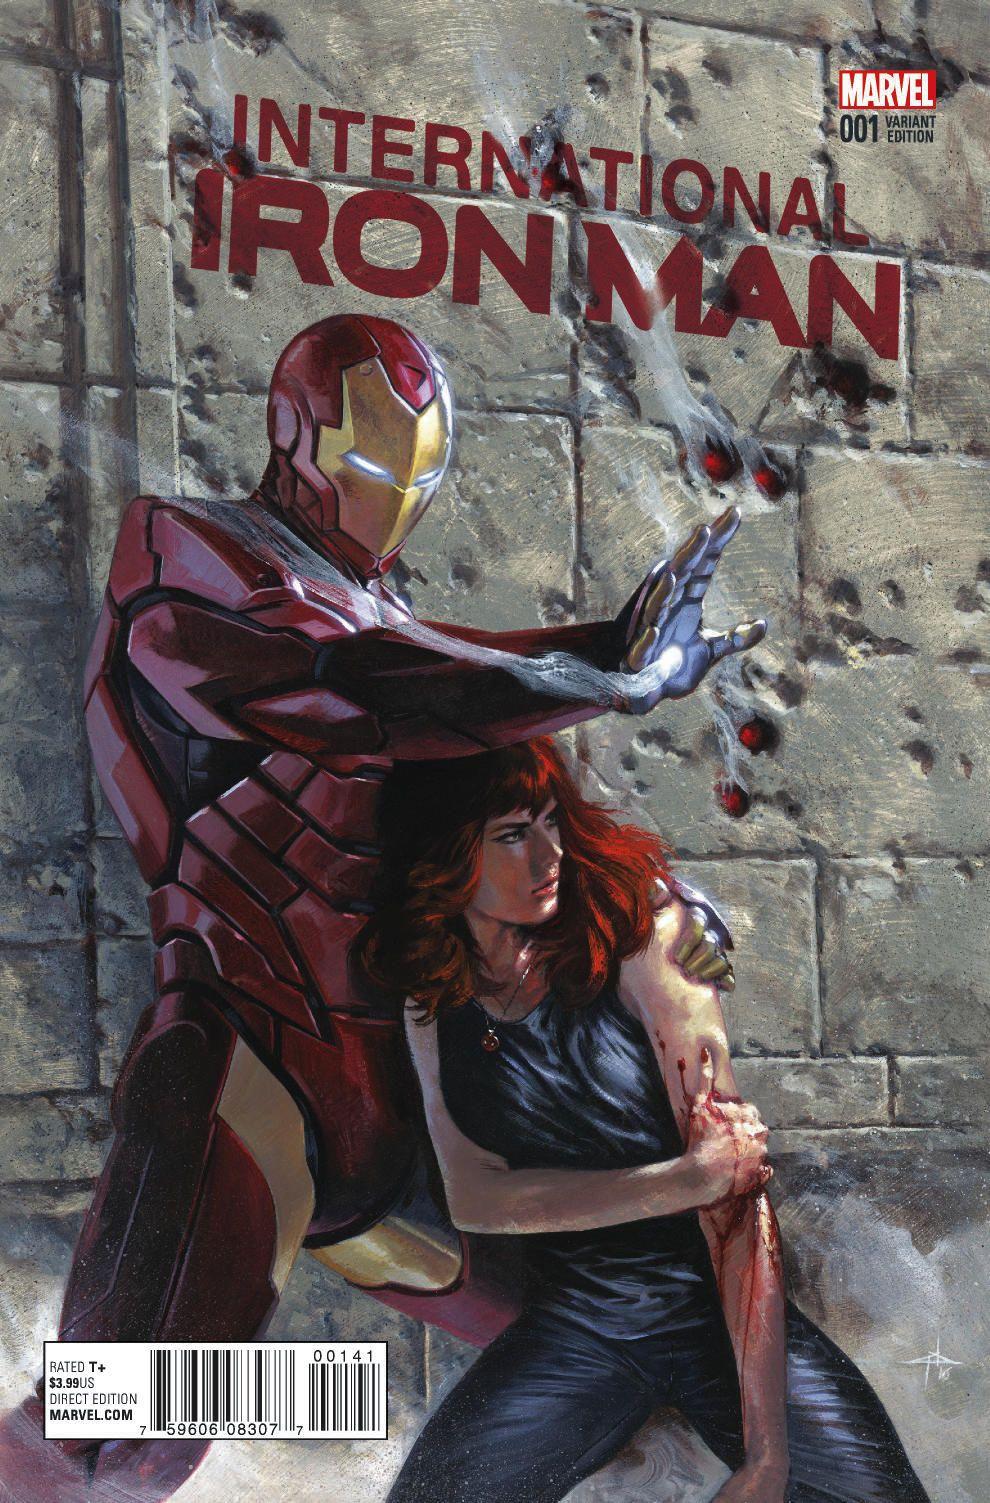 First Look: International Iron Man #1 - Bounding Into Comics